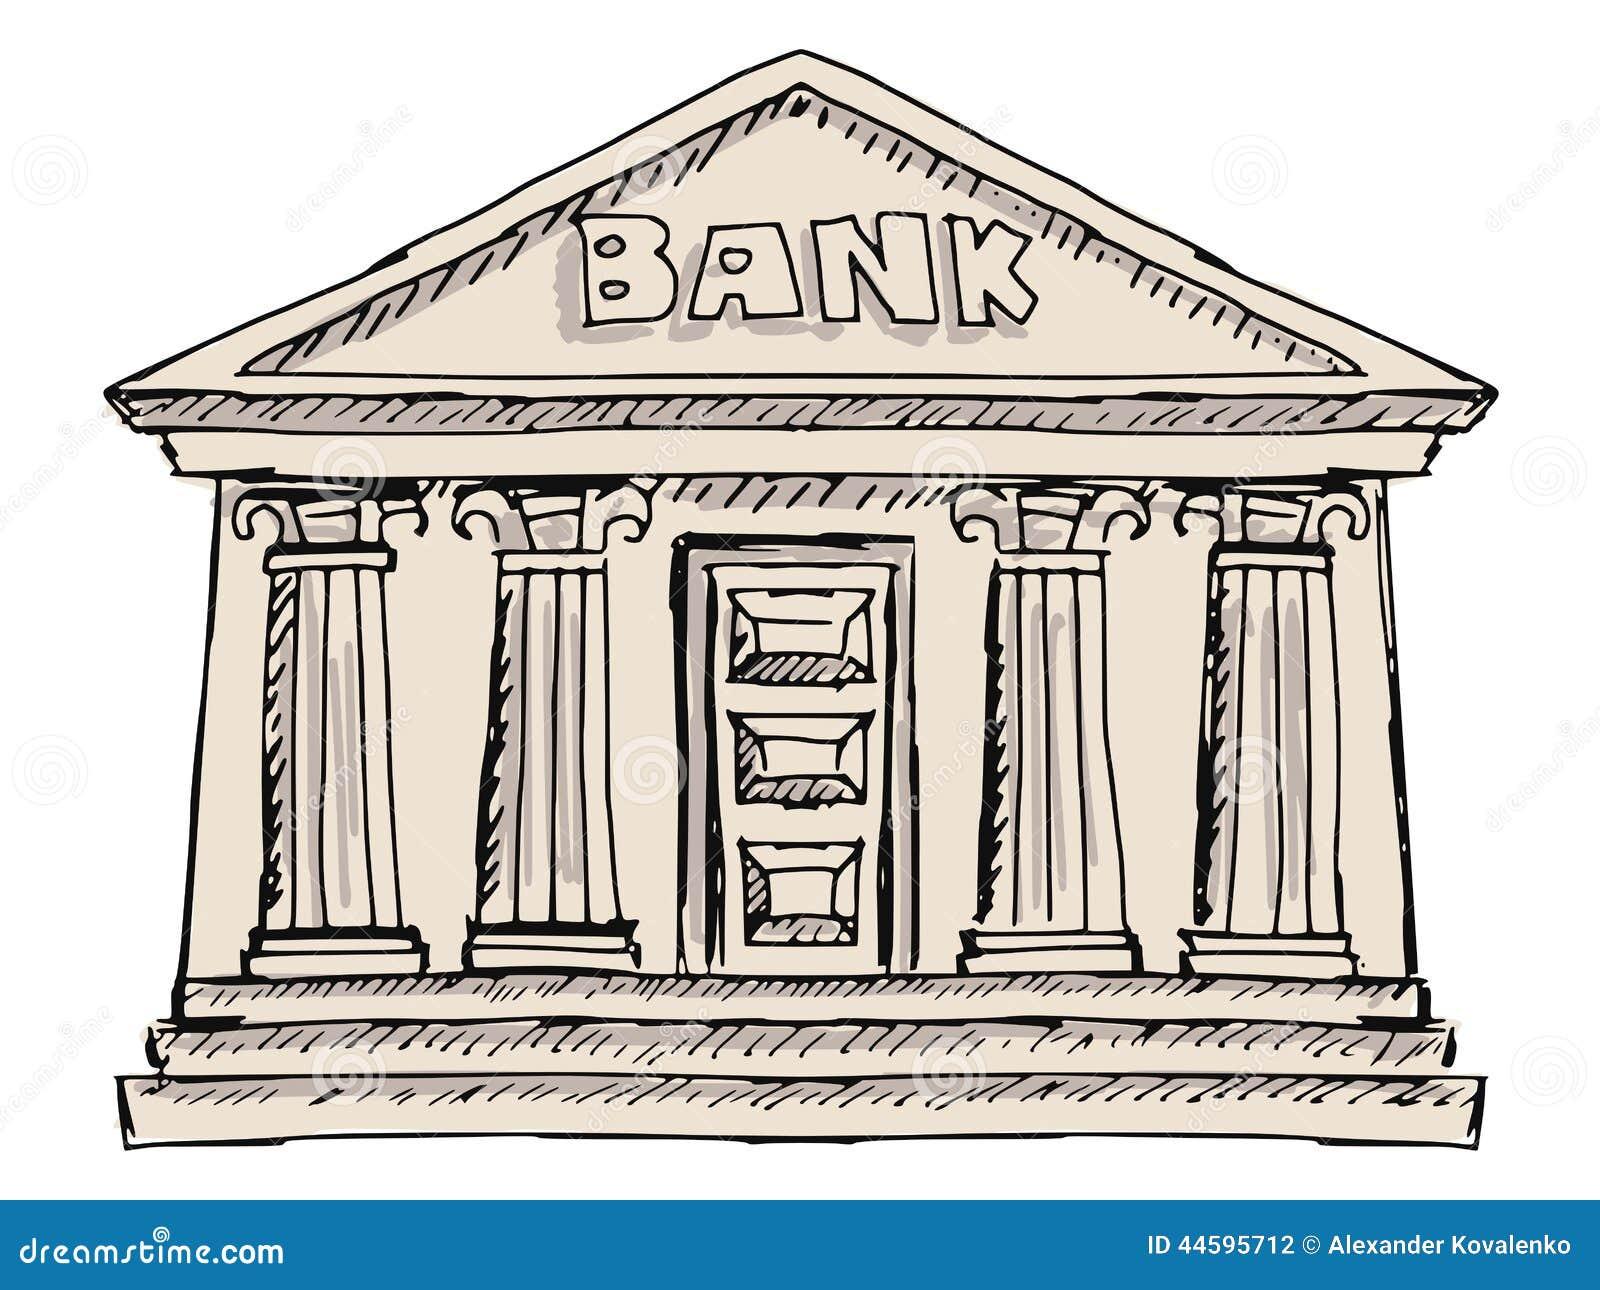 bank clip art